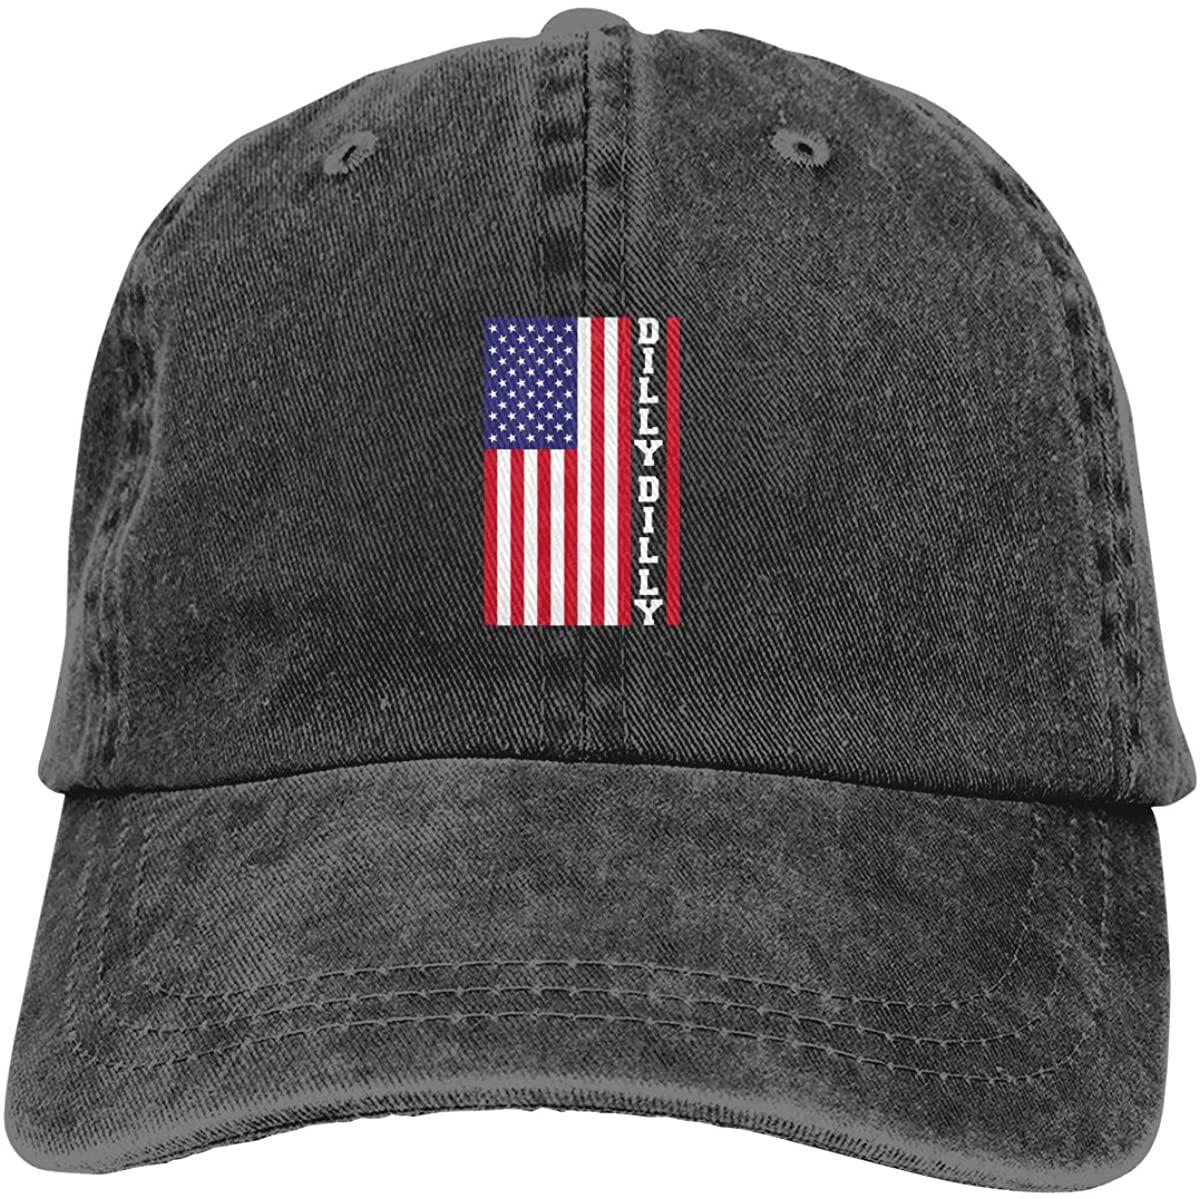 FHdbing Dilly Dilly American Flag Adjustable Cowboy Cap Denim Hat for Women & Men